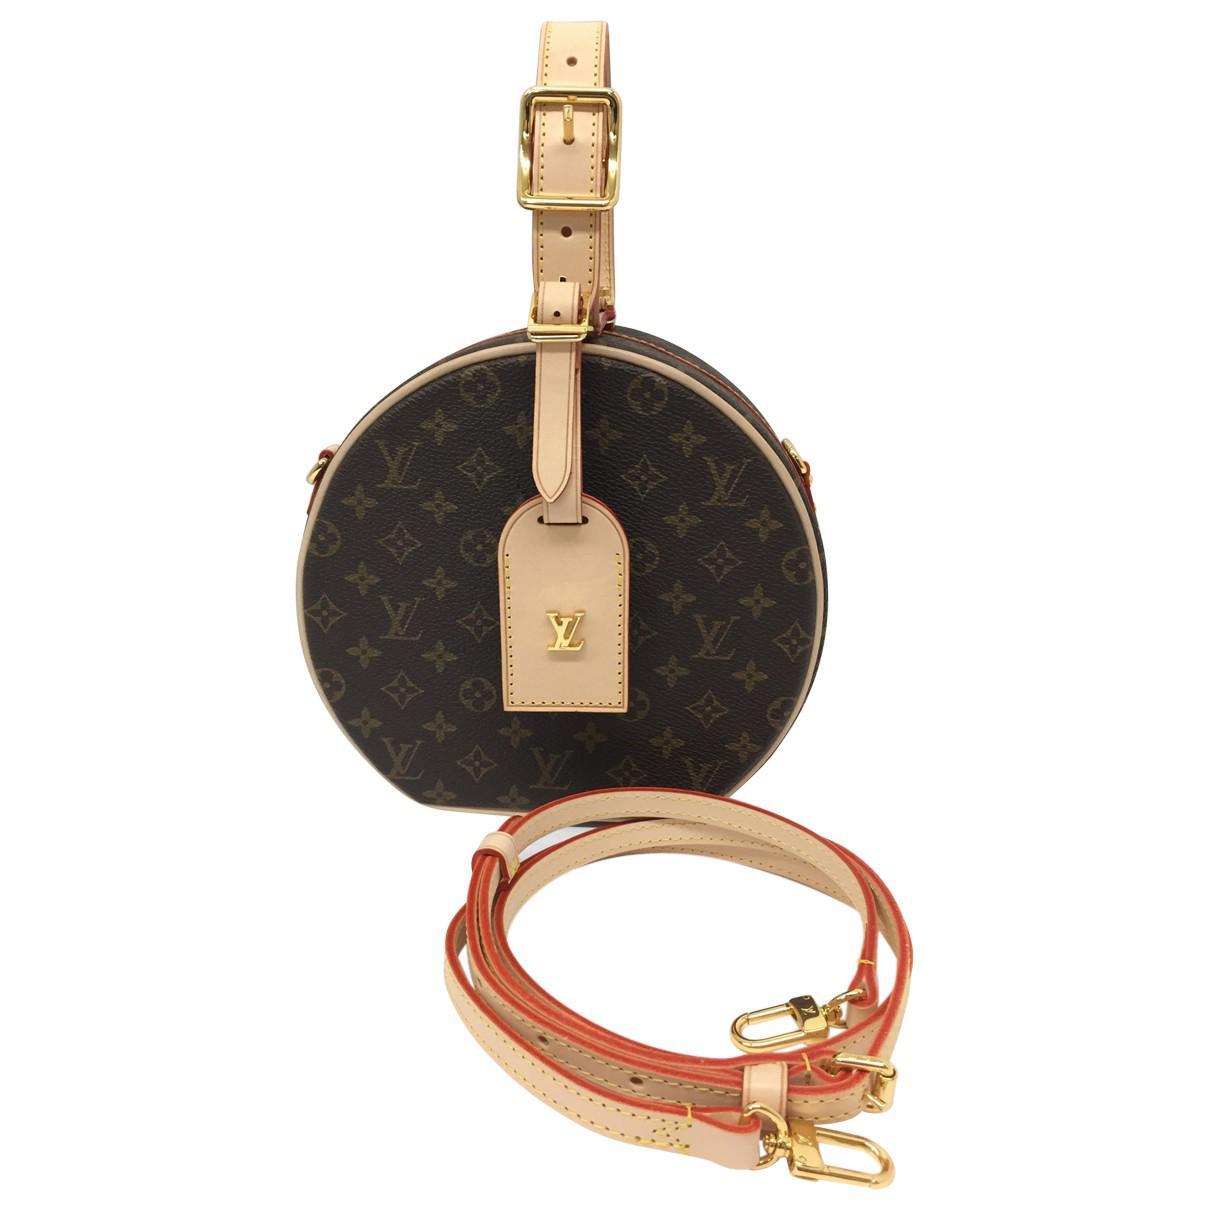 2190a75e8dee Lyst - Louis Vuitton Pre-owned Petite Boîte Chapeau Cloth Handbag in ...